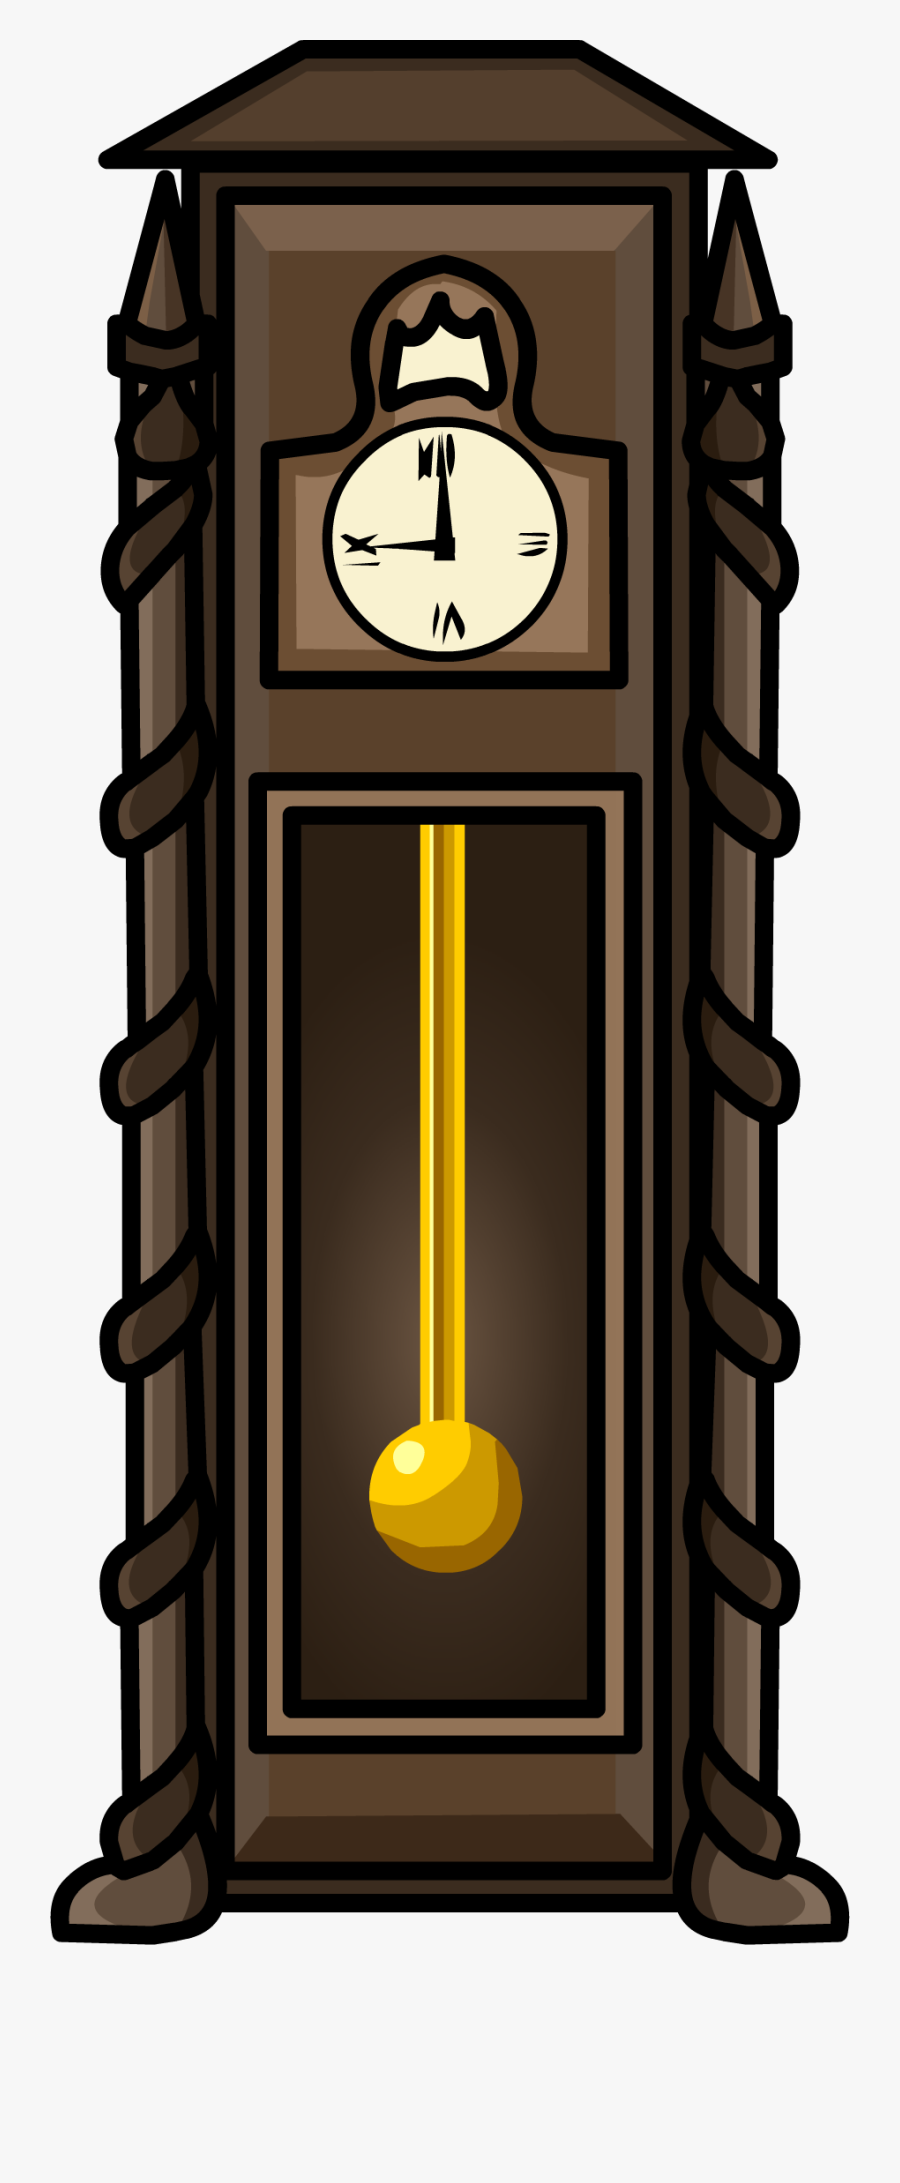 Transparent Vintage Clock Png - Club Penguin Clock Furniture, Transparent Clipart